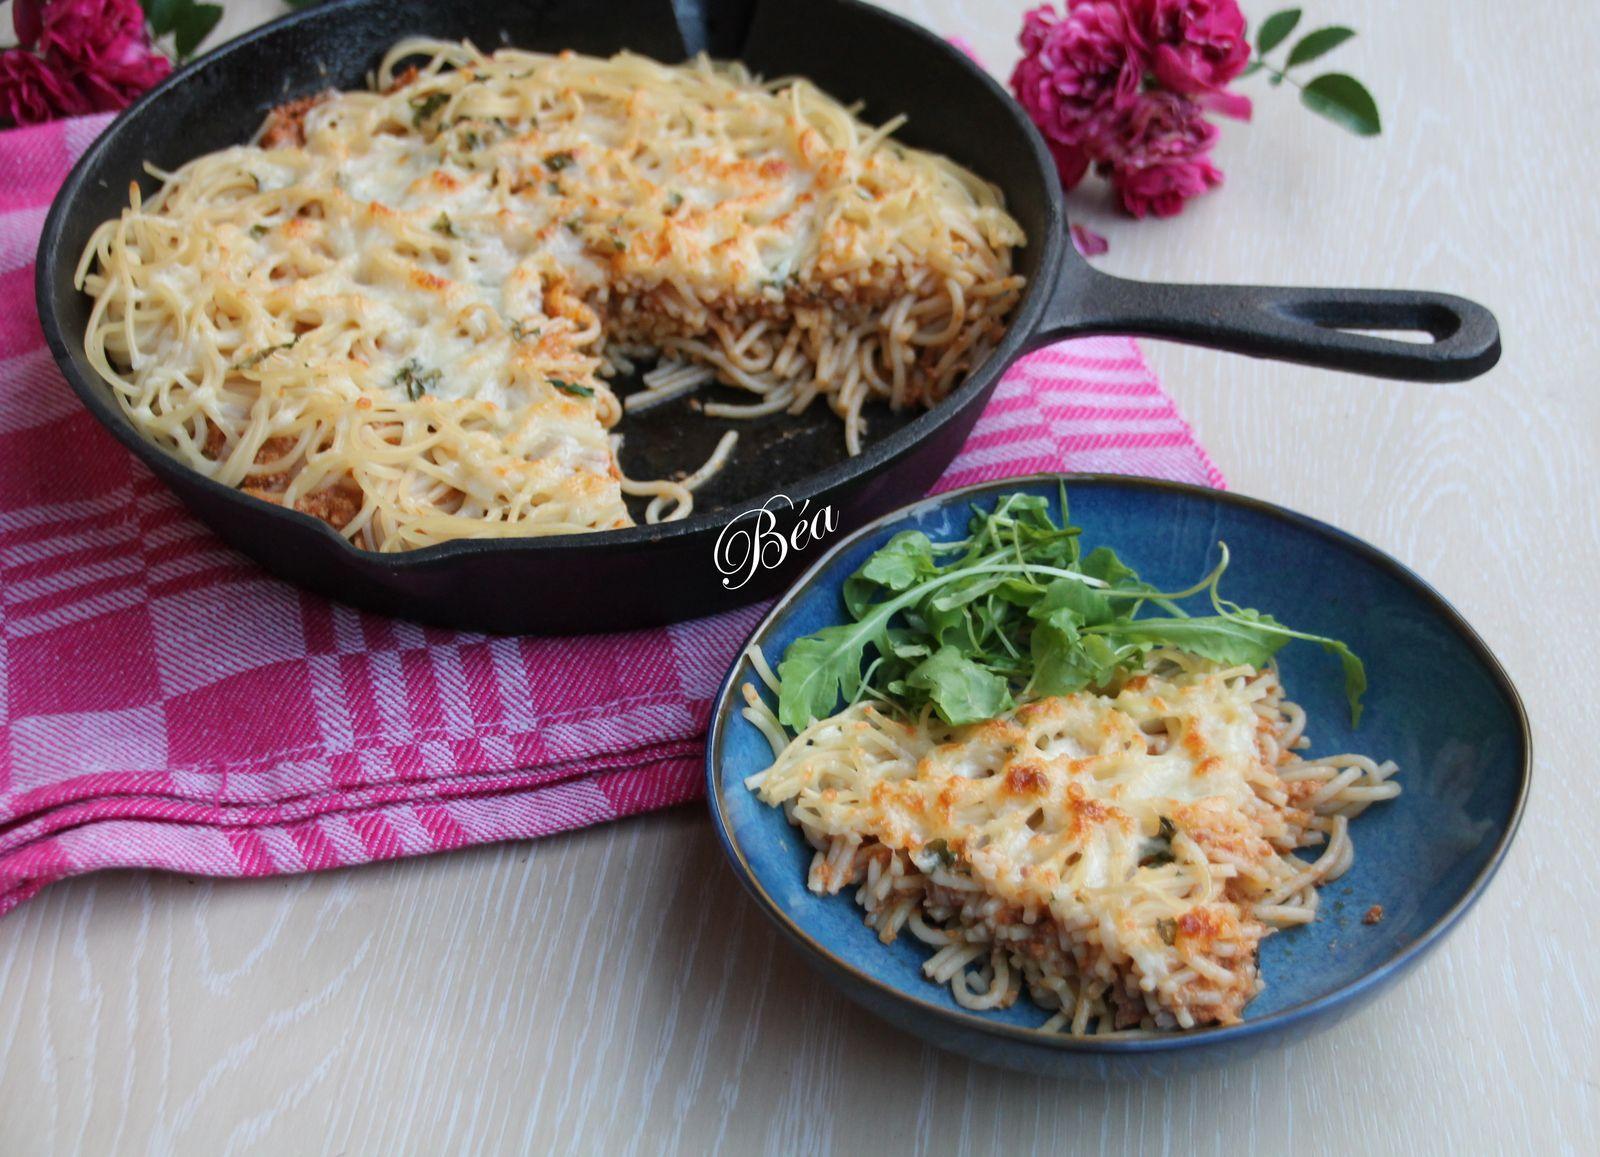 Gâteau de spaghetti au thon et au pesto rouge